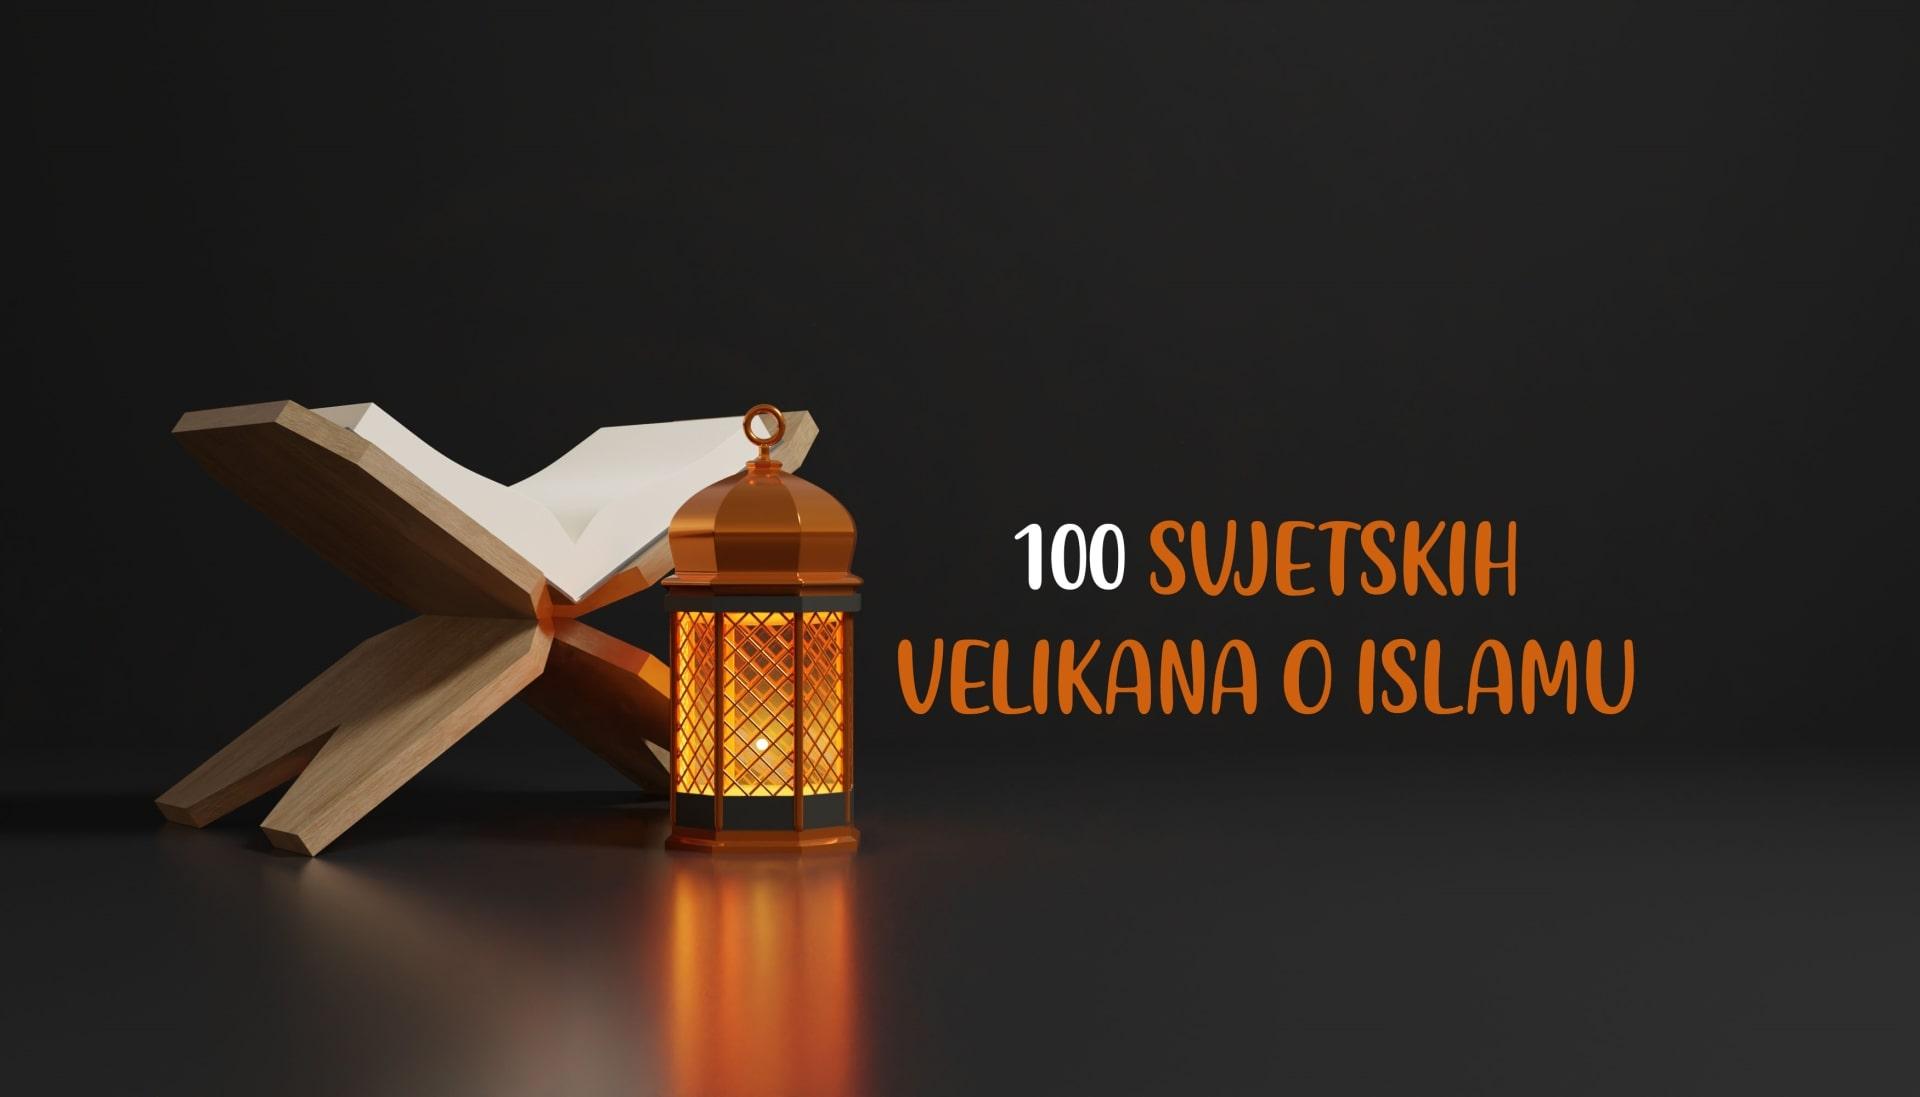 100 svjetskih velikana o islamu – Edvard Monte Poučne priče El-Kelimeh Islamske knjige Islamska literatura